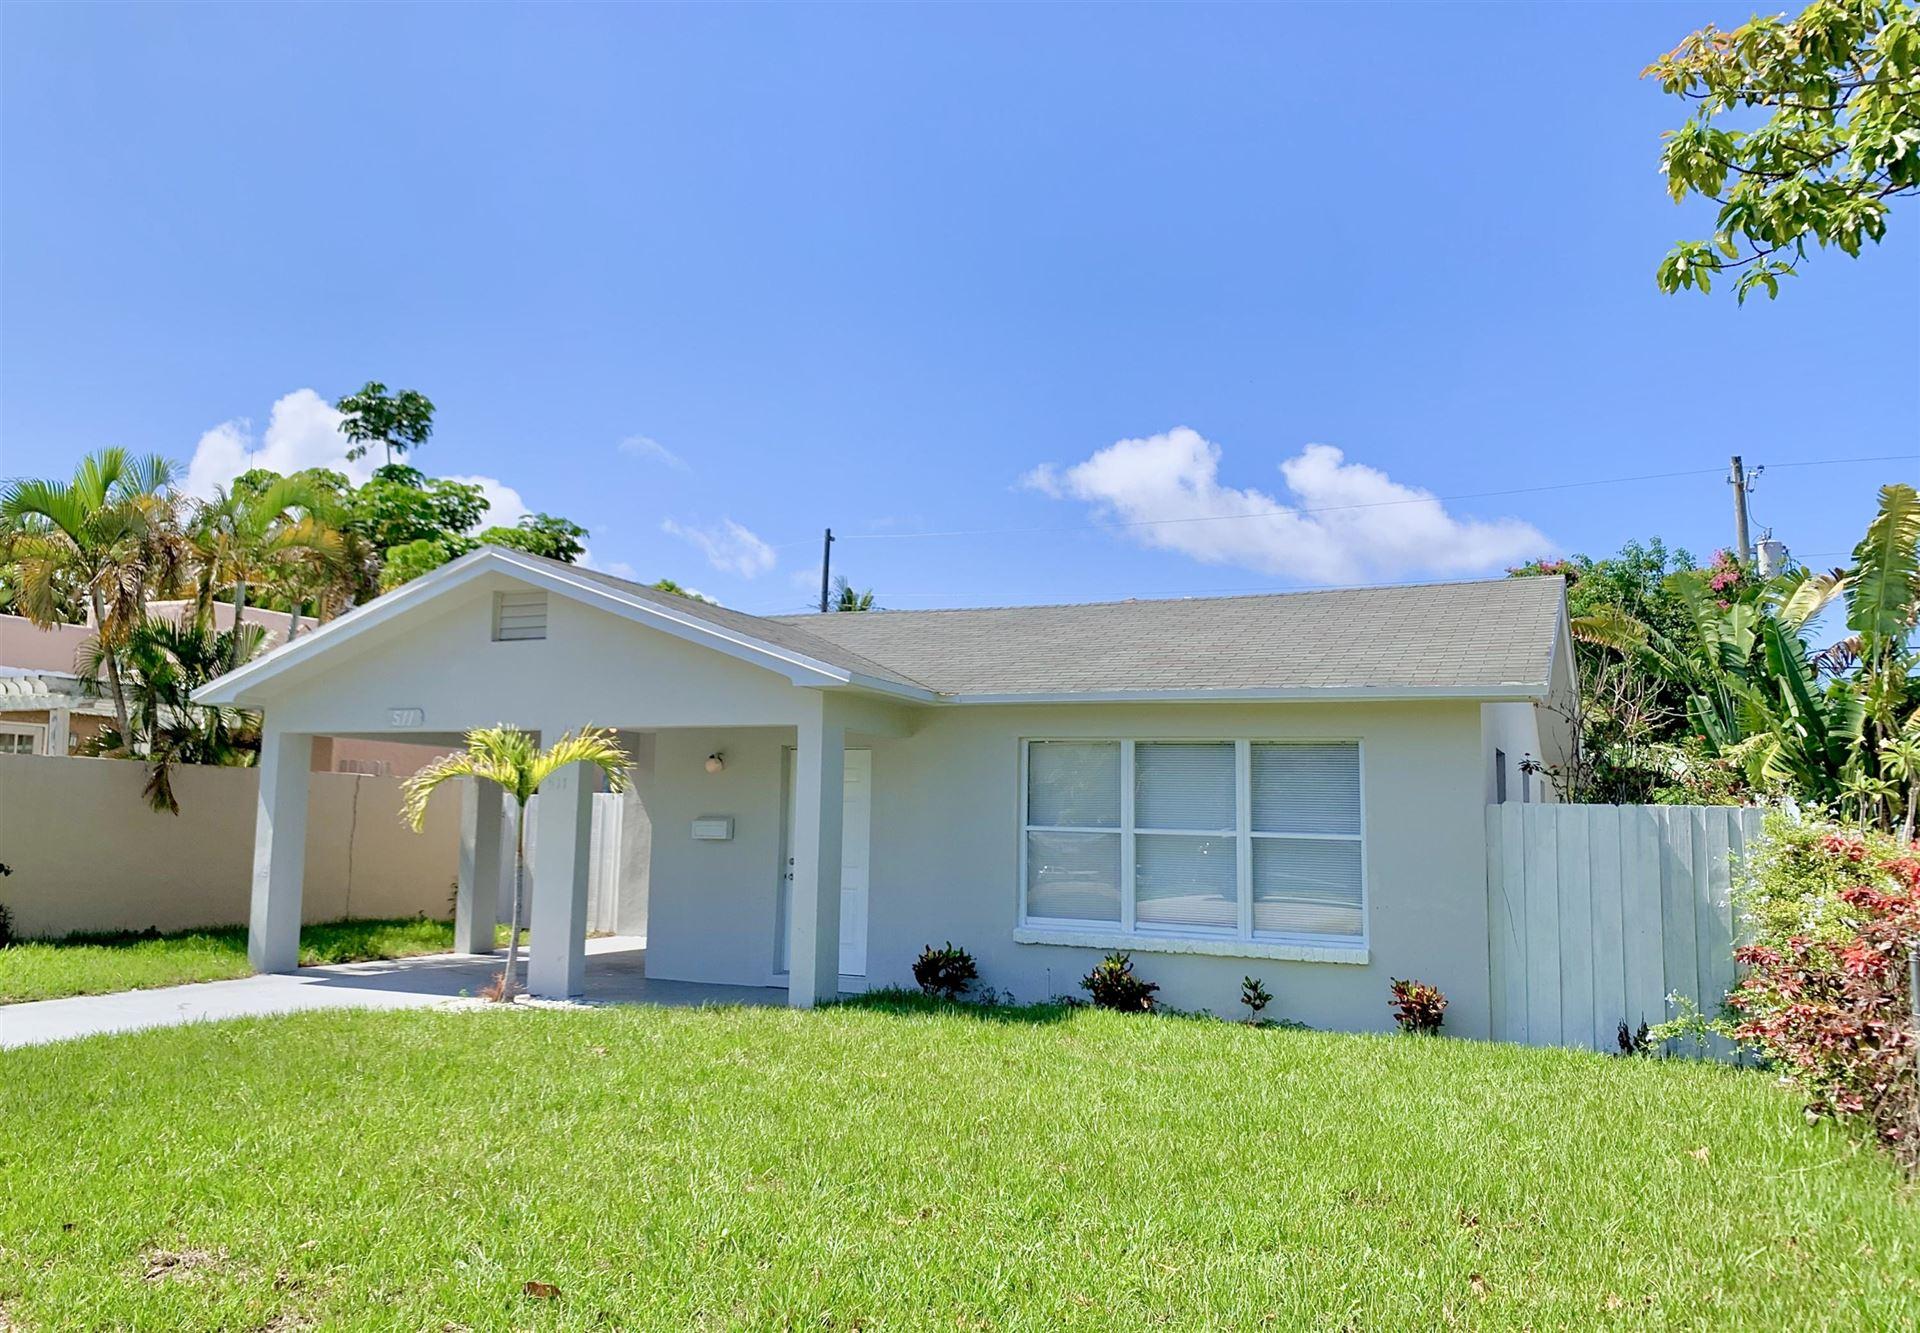 511 36th Street, West Palm Beach, FL 33407 - #: RX-10629749